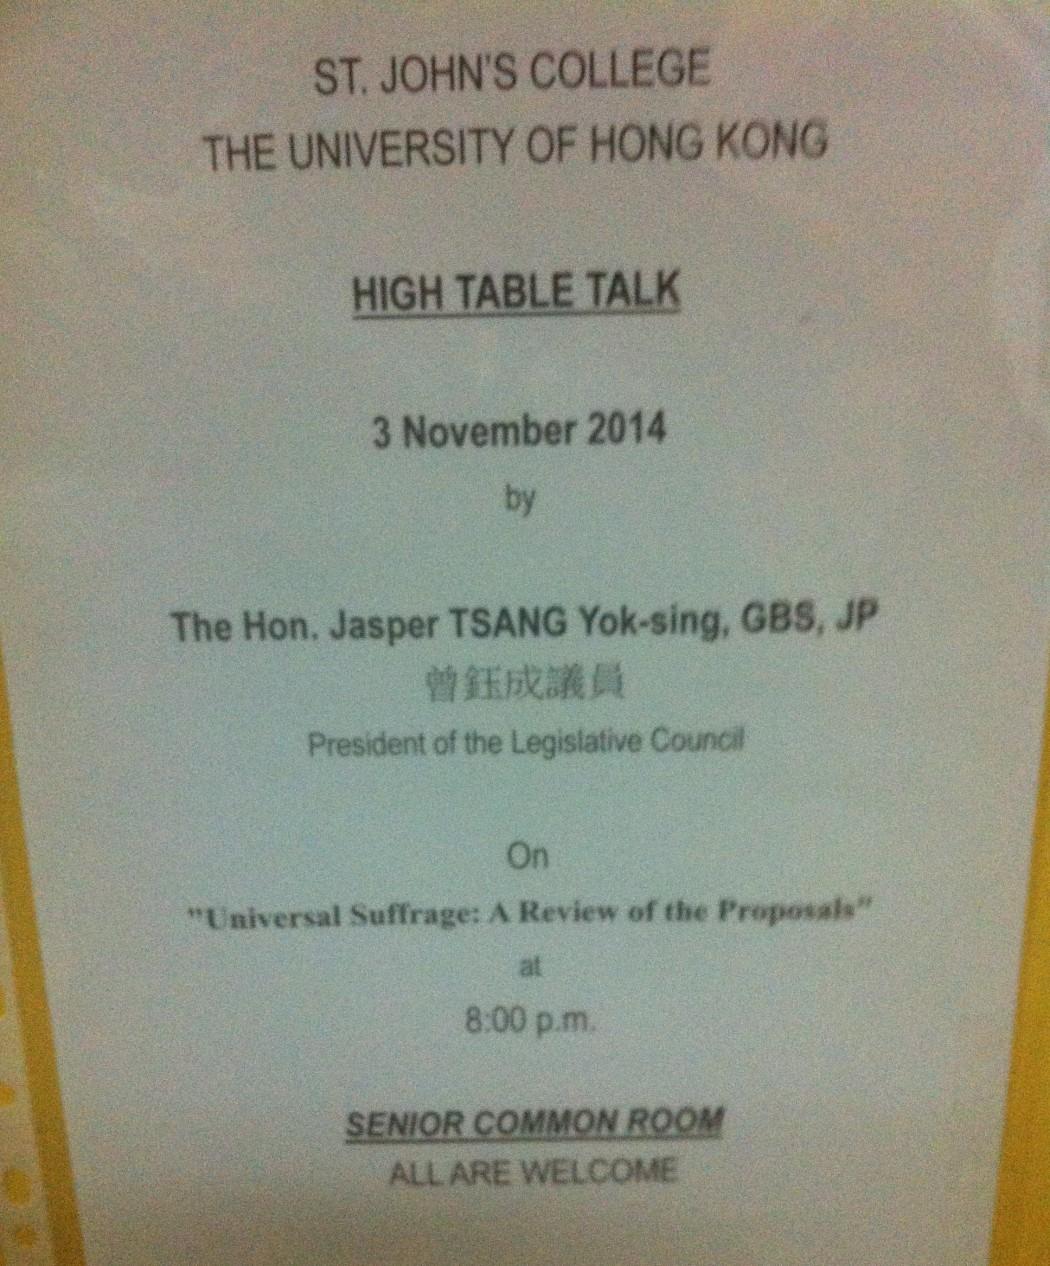 Jasper Tsang Yok-sing event